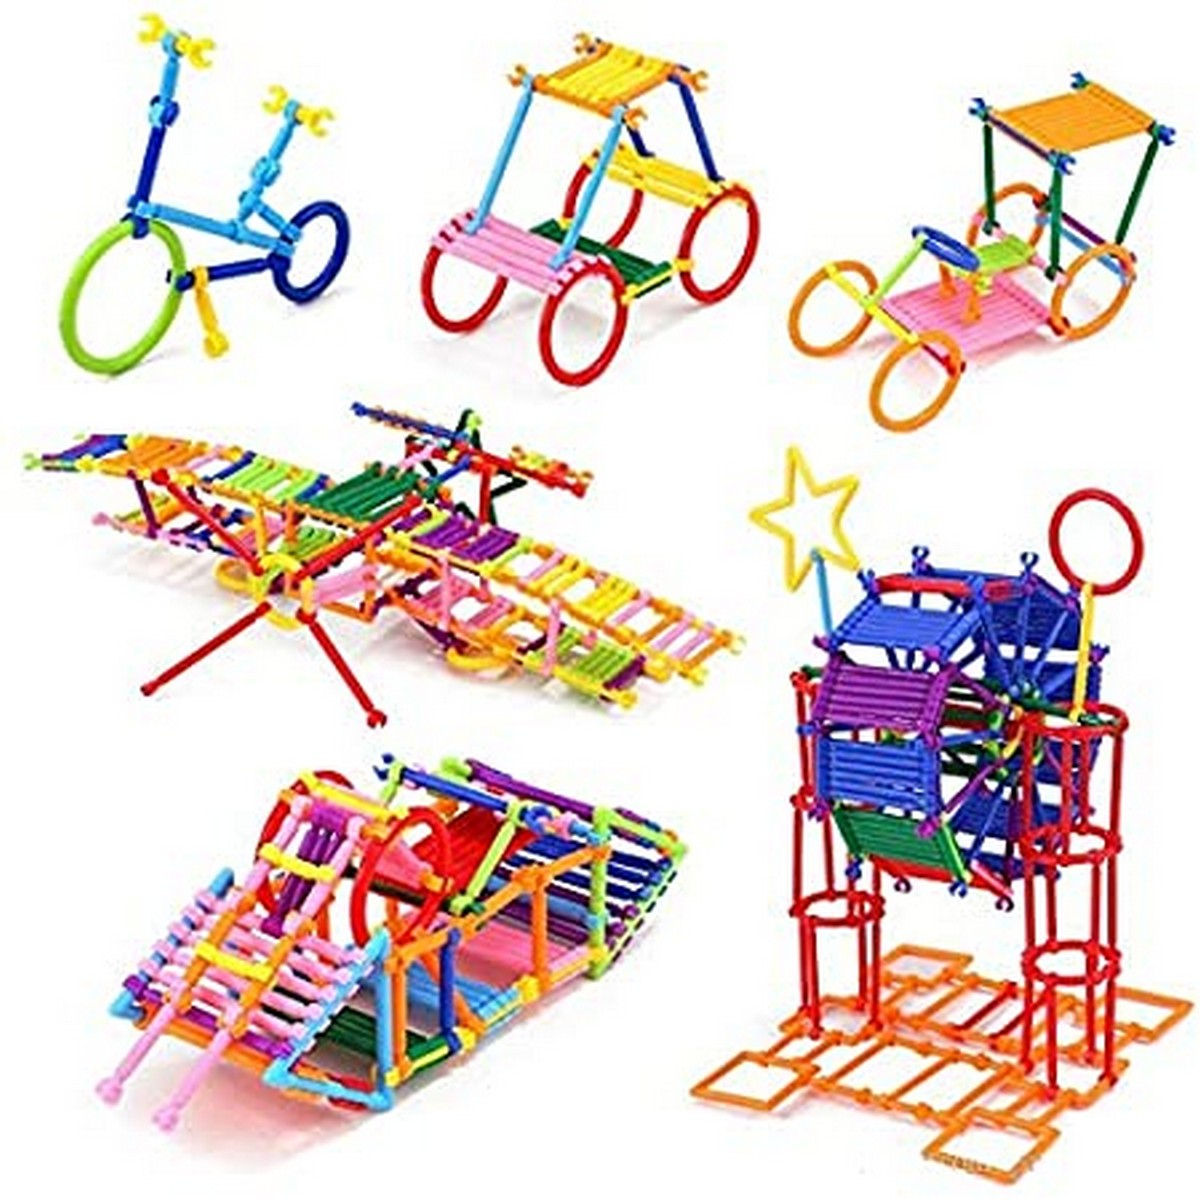 600 Pcs - Dream Colorful Activity Sticks Building Blocks Toys for Boys Girl Kids Children-